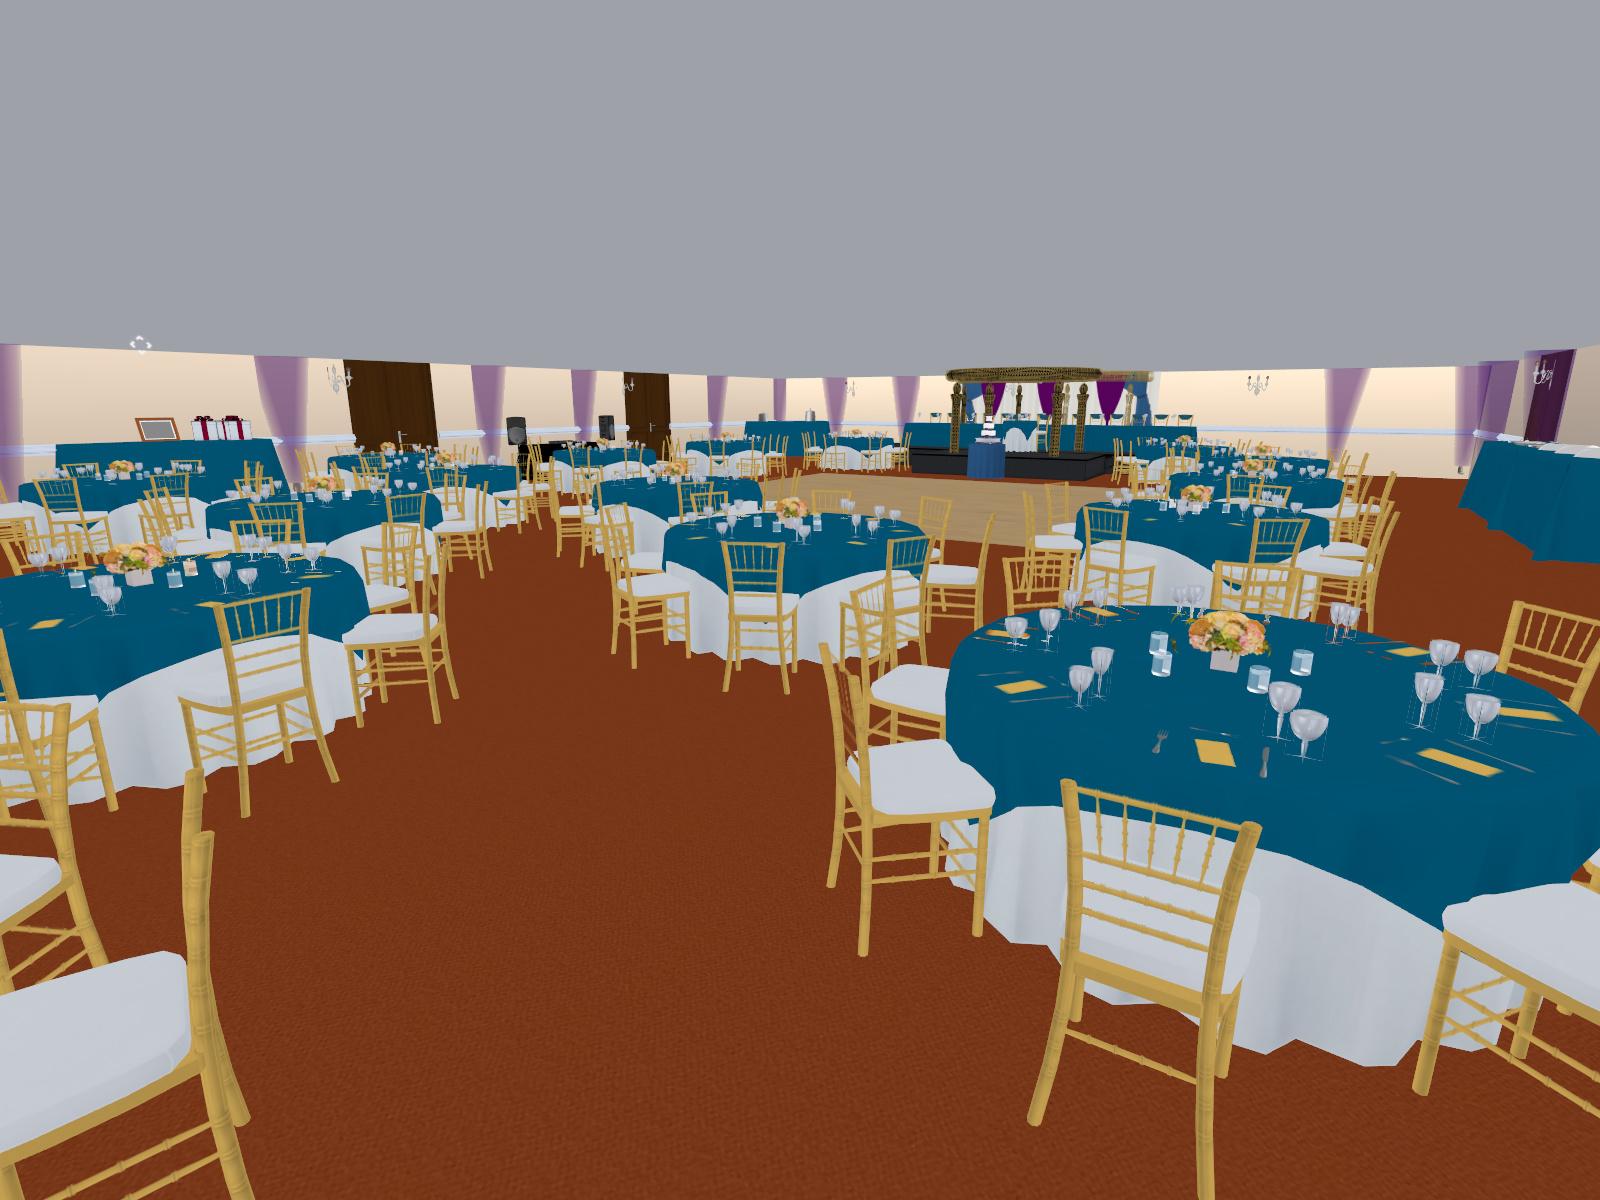 3D rendering of formal wedding